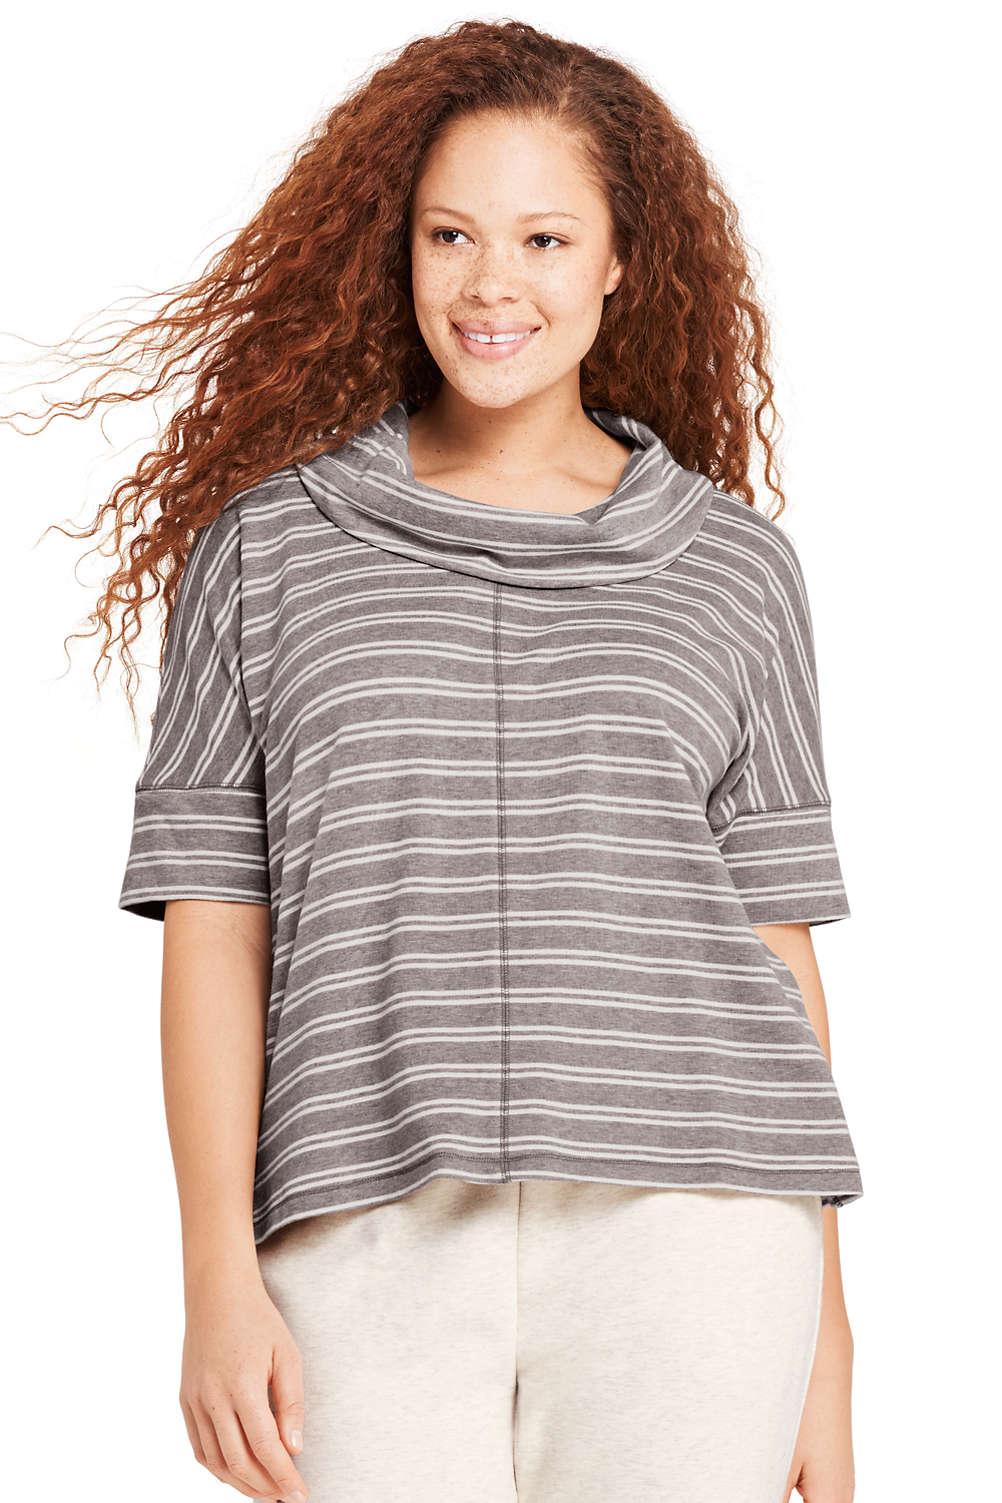 bff4f8a67feb Women s Plus Size Stripe Dolman Sleeve Cowl Neck Top from Lands  End